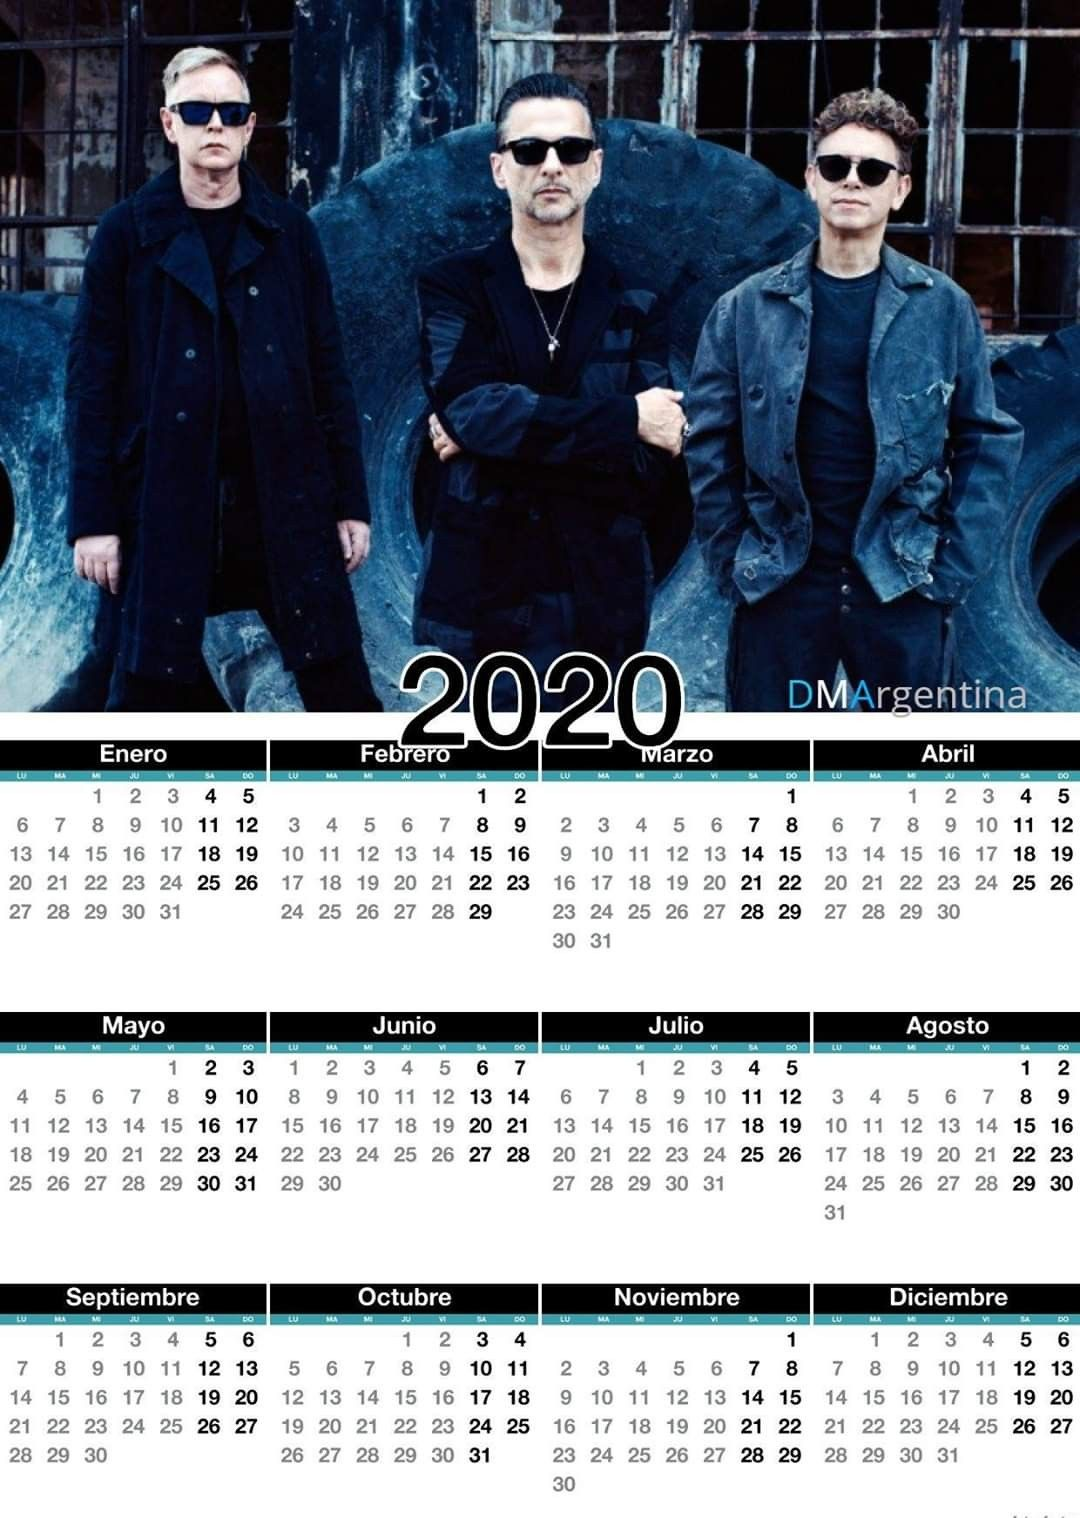 Pin de Ágnes Kovács en depeche mode forever en 2020